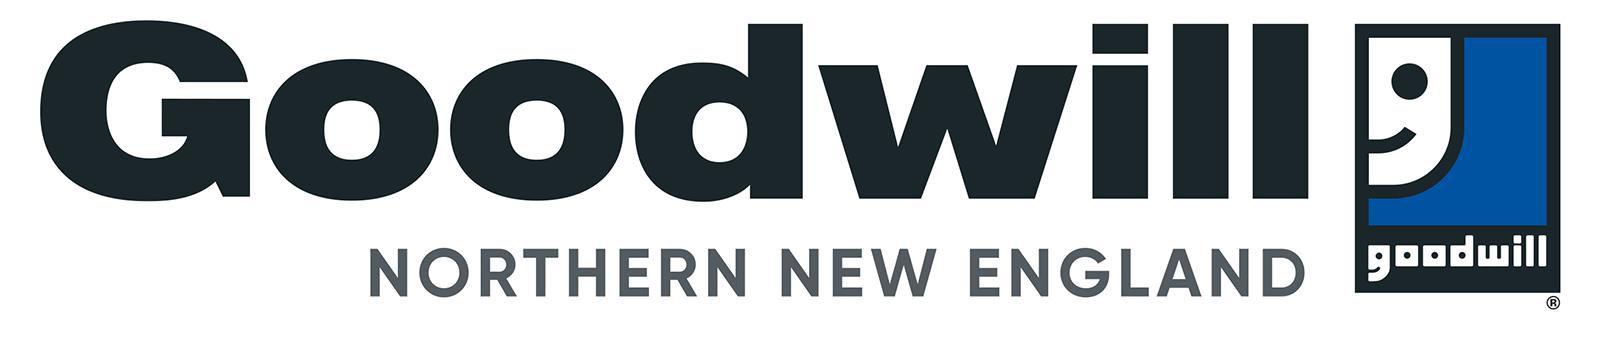 Goodwill NNE Logo